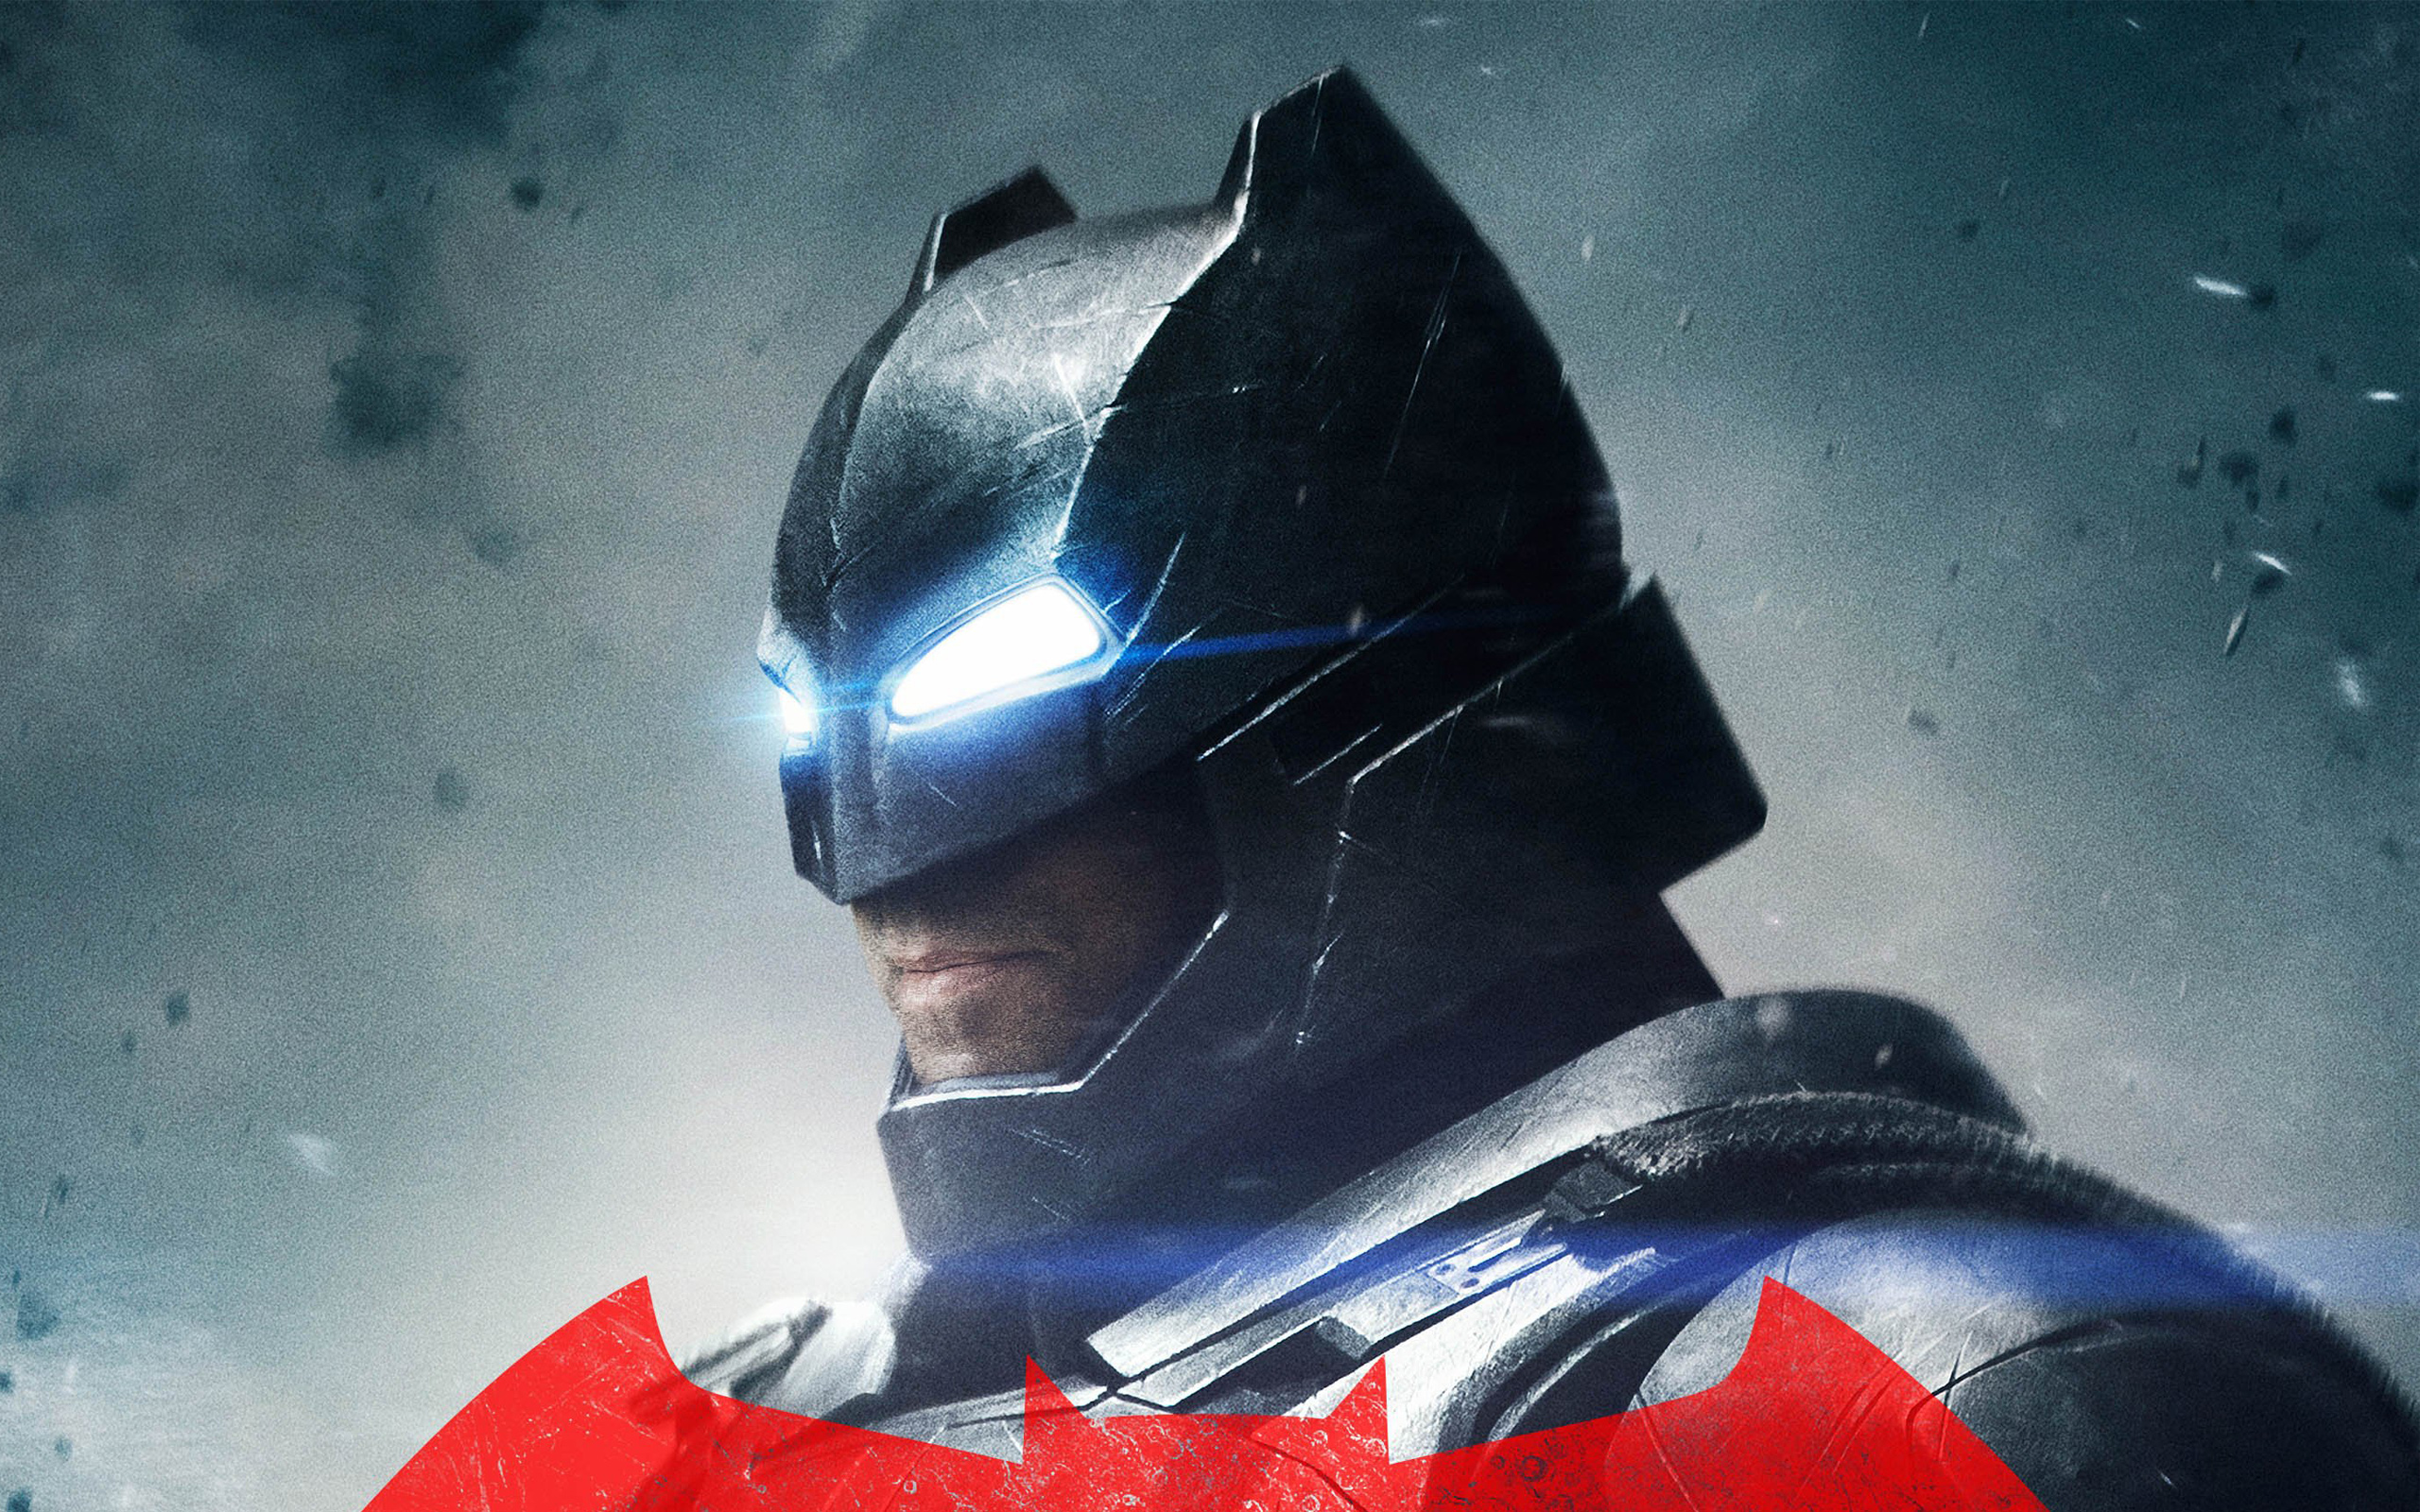 2560x1600 Batman Vs Superman Resolution HD 4k Wallpapers